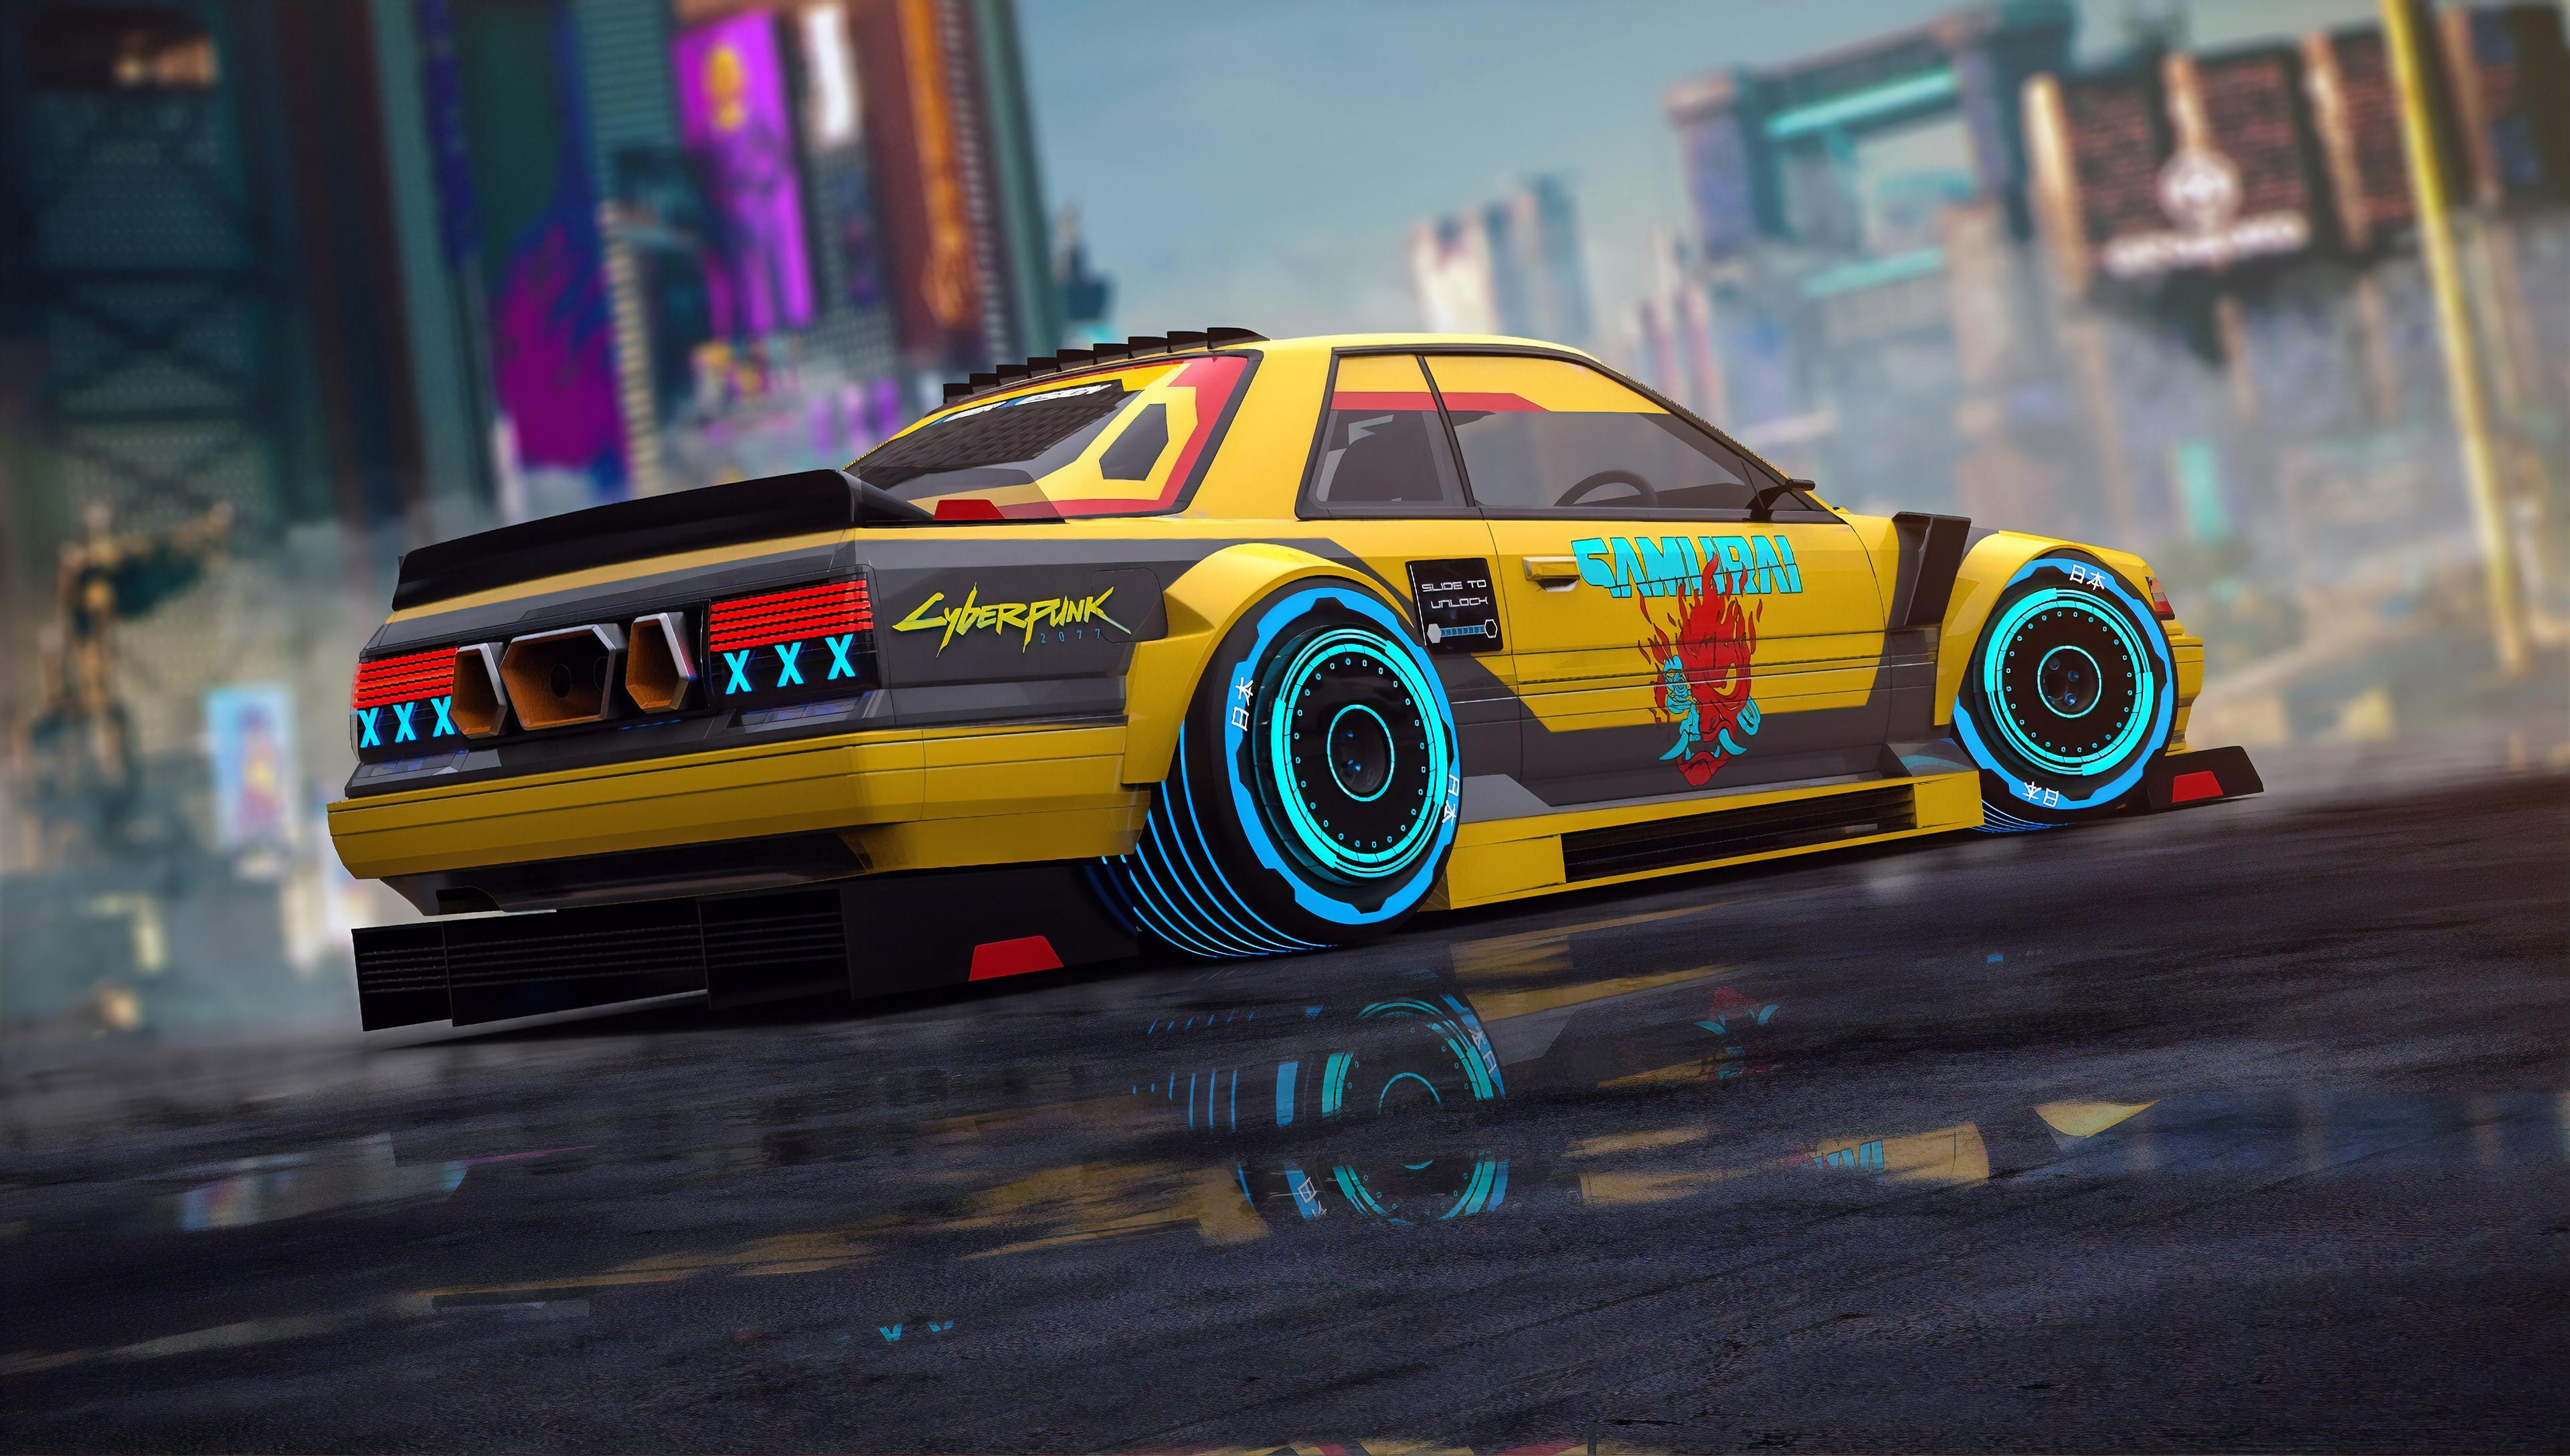 Cyberpunk Car Art 4k HD Games 4k Wallpapers